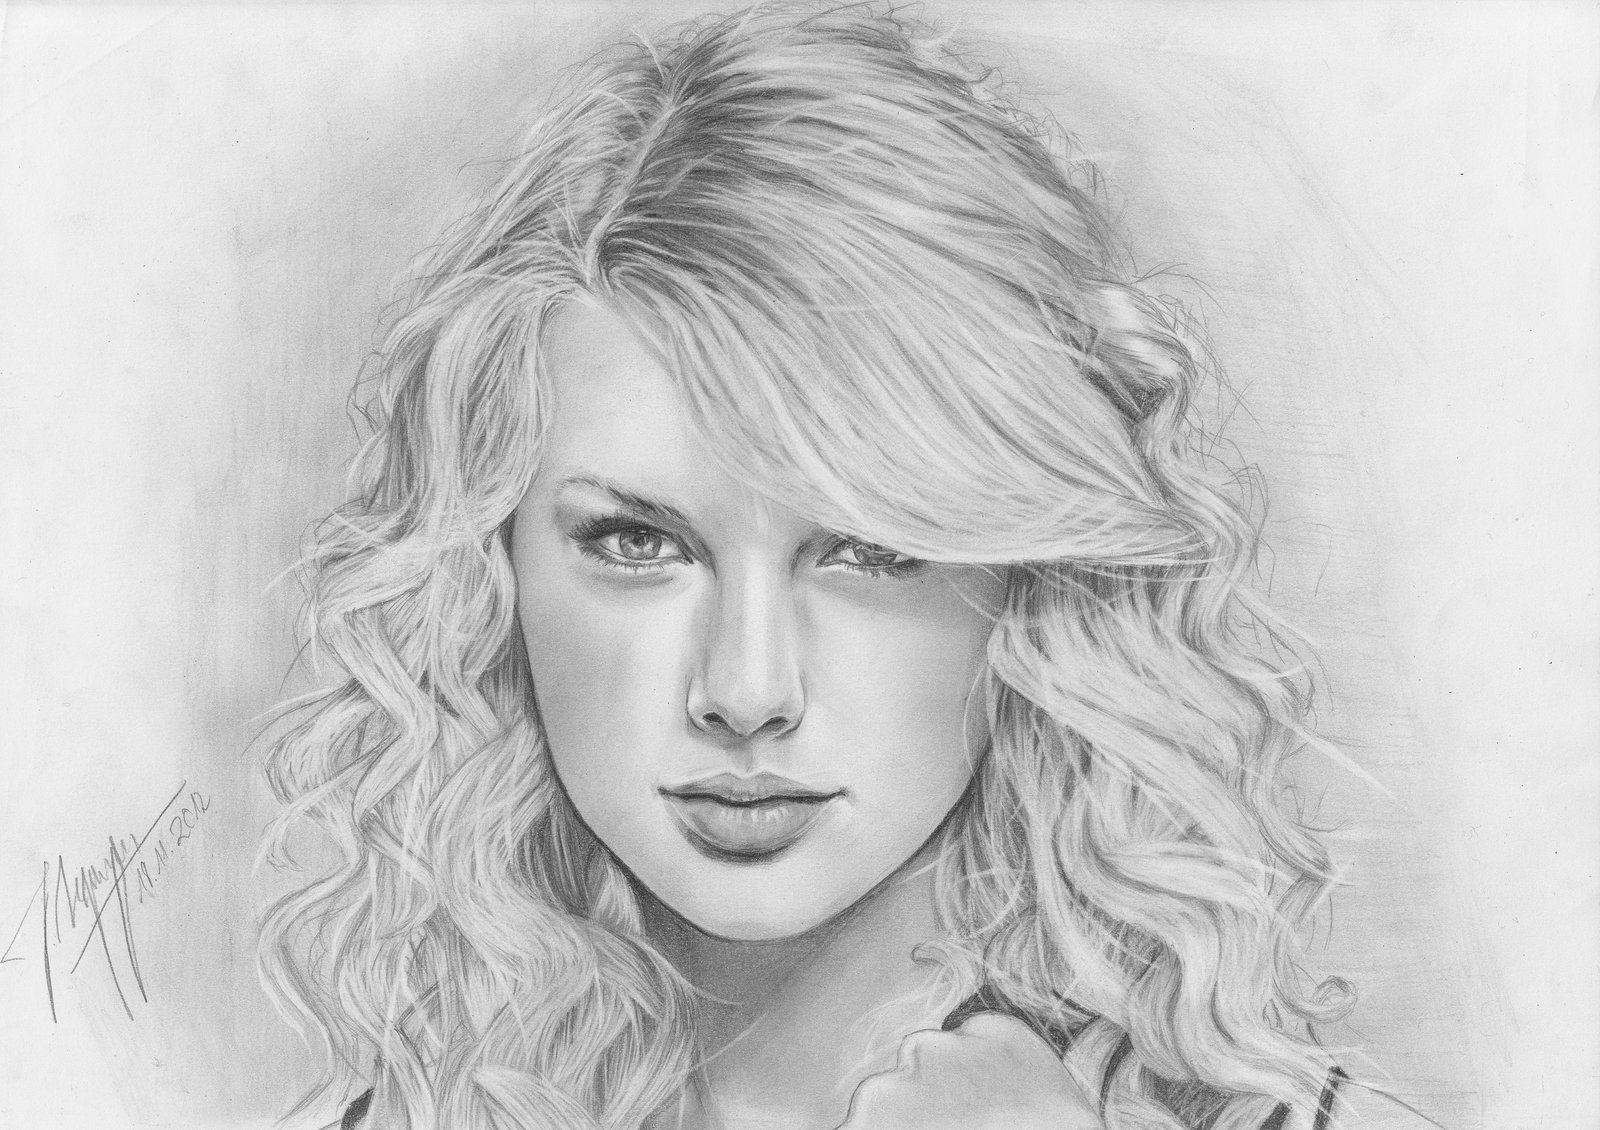 Drawn portrait taylor swift AfterSchoolArts by Swift Taylor Taylor